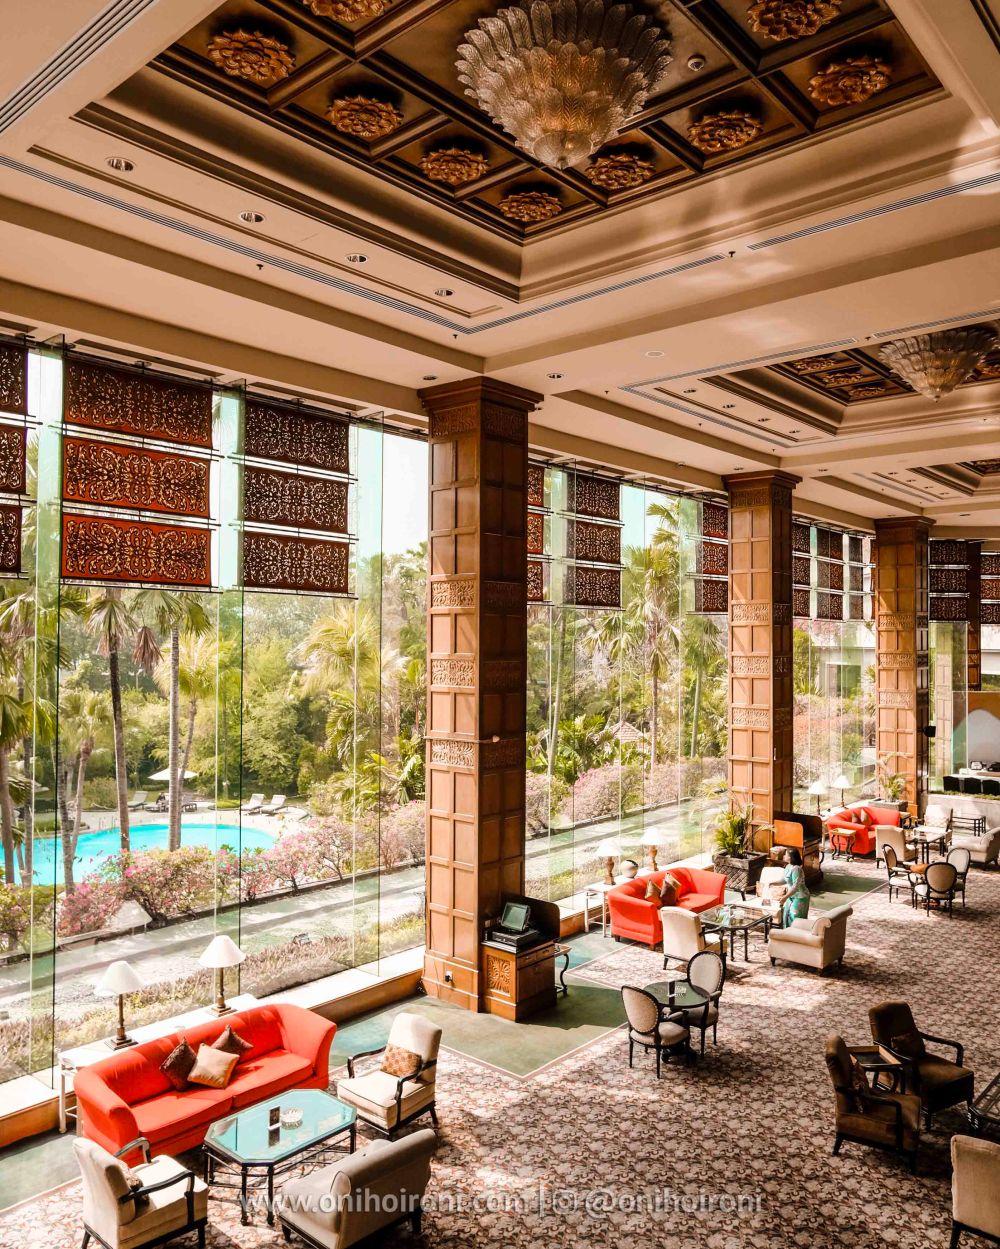 2 Review Lobby Shangrila Surabaya Hotel Oni hoironi